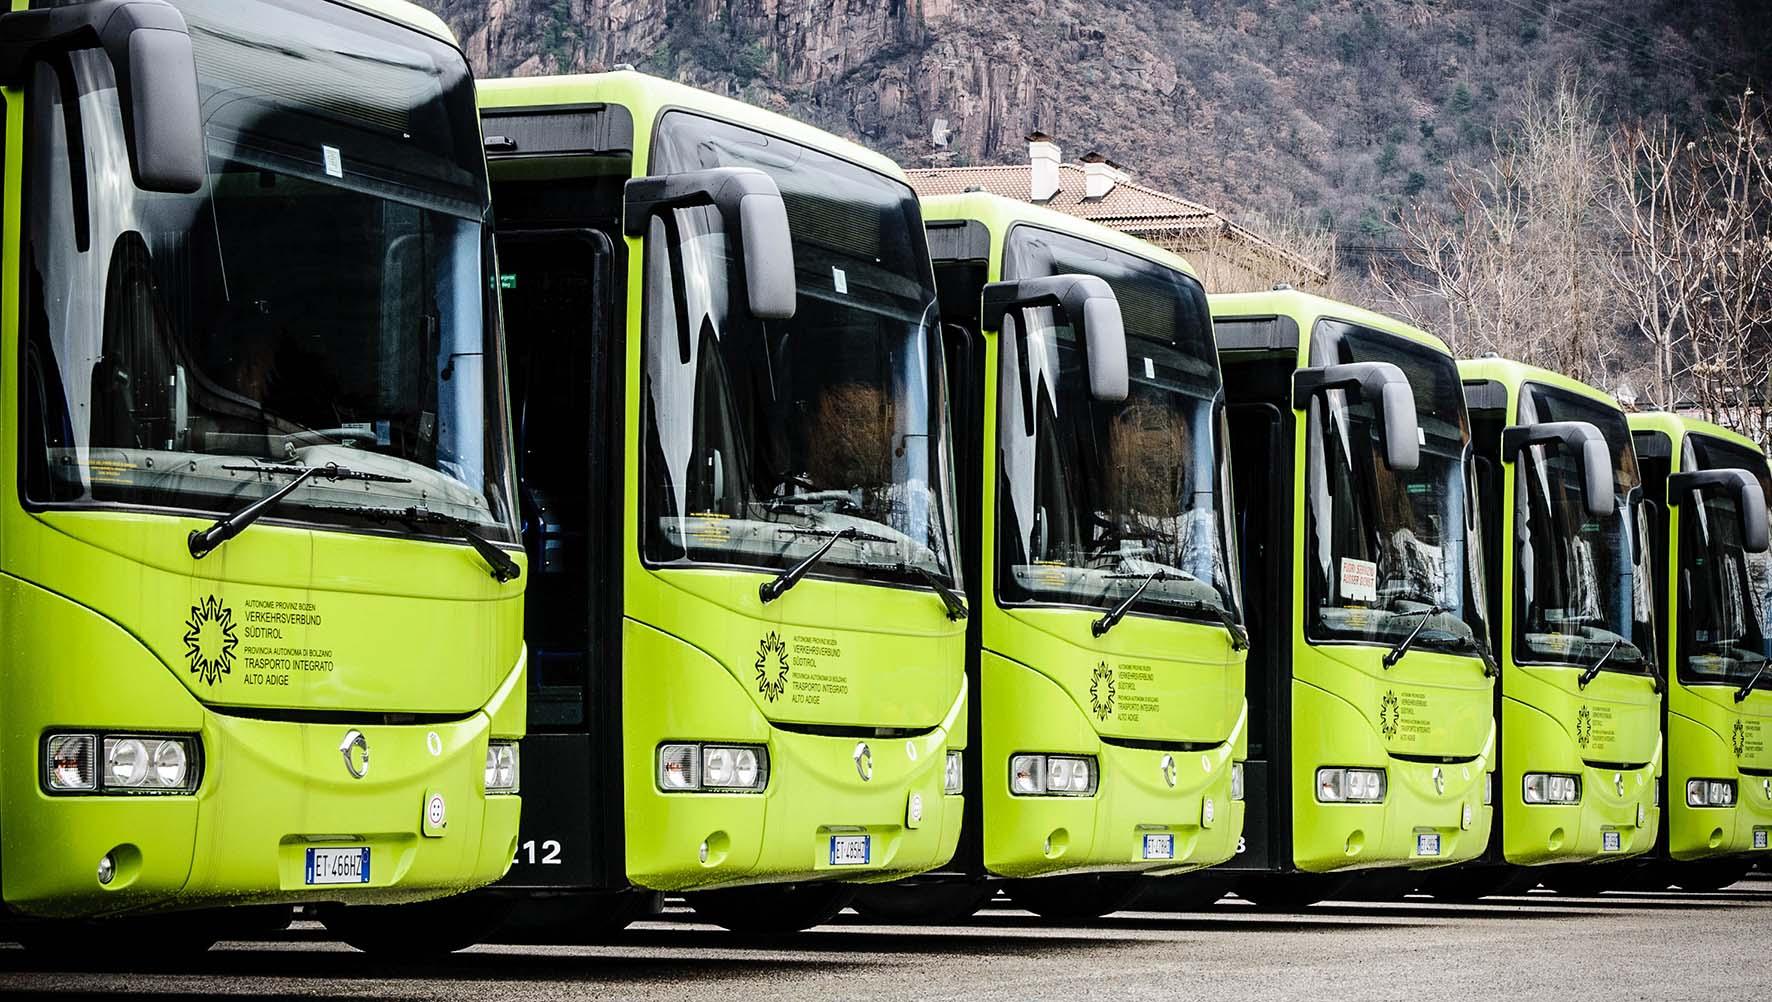 Sad nuova flotta autobus extraurbano alto adige